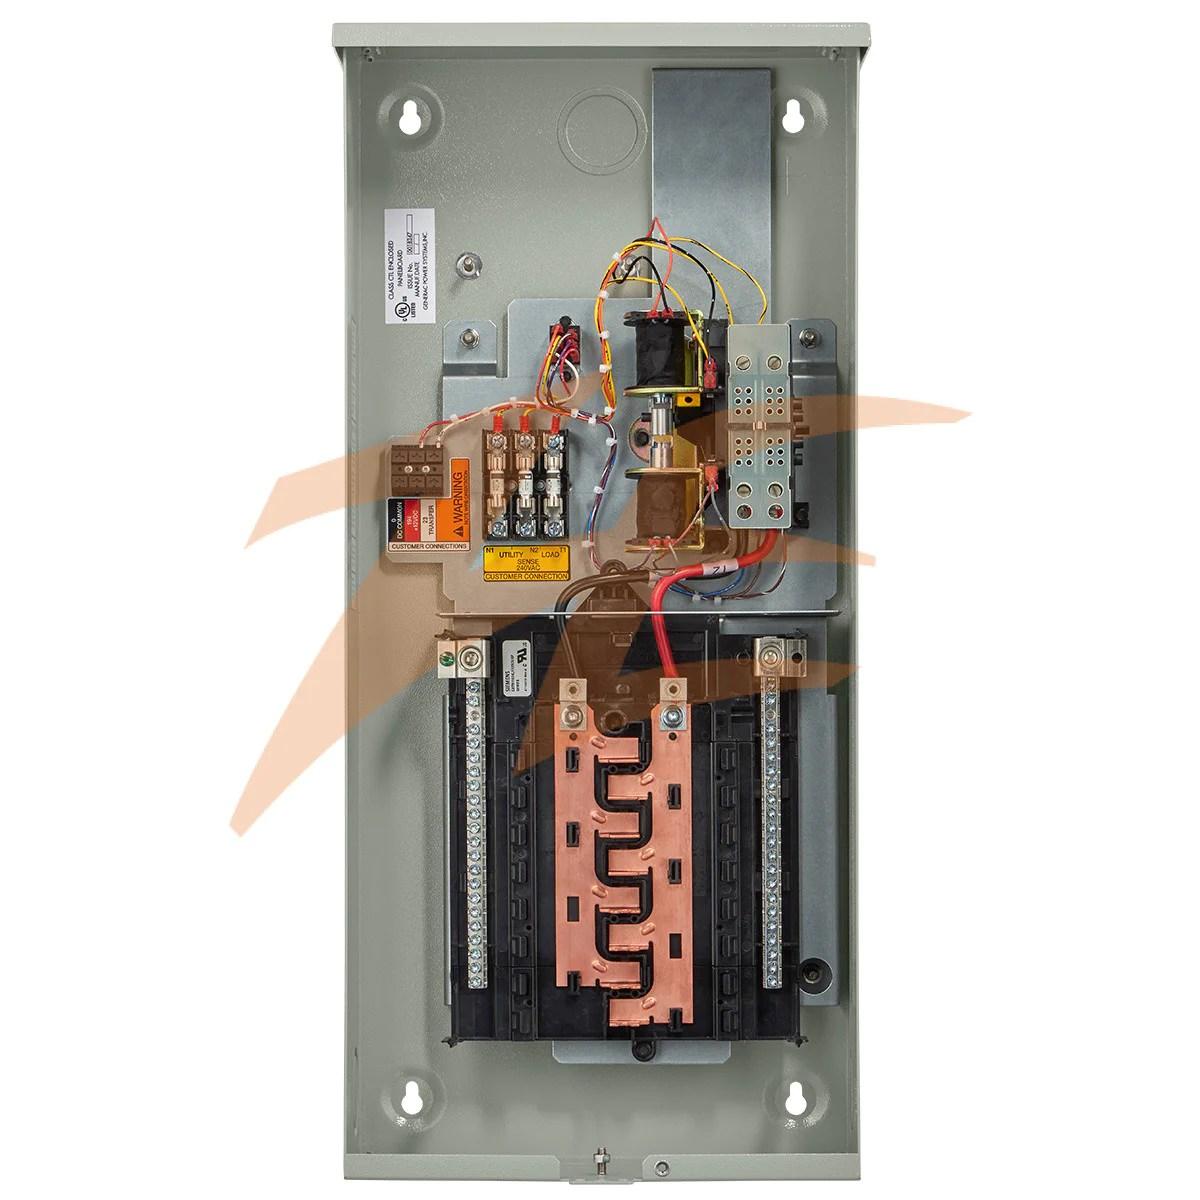 amp generac transfer switch wiring diagram on generac xp8000e wiring diagram generac nexus controller wiring  [ 1200 x 1200 Pixel ]